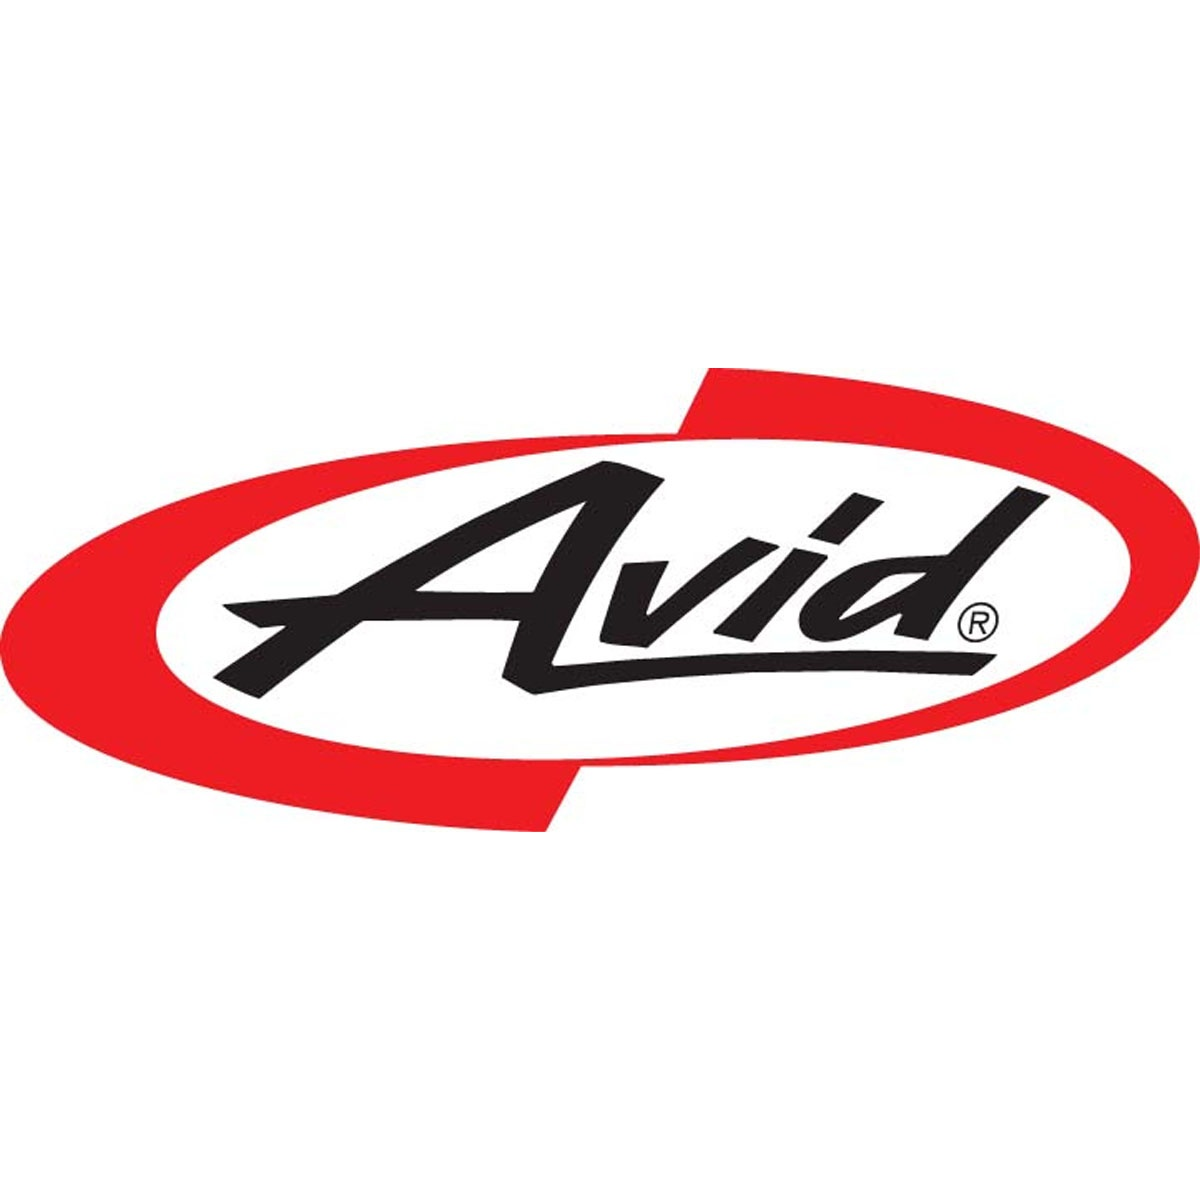 Avid Brake Mounting Post Bracket - 20P F180/R160 CPS and